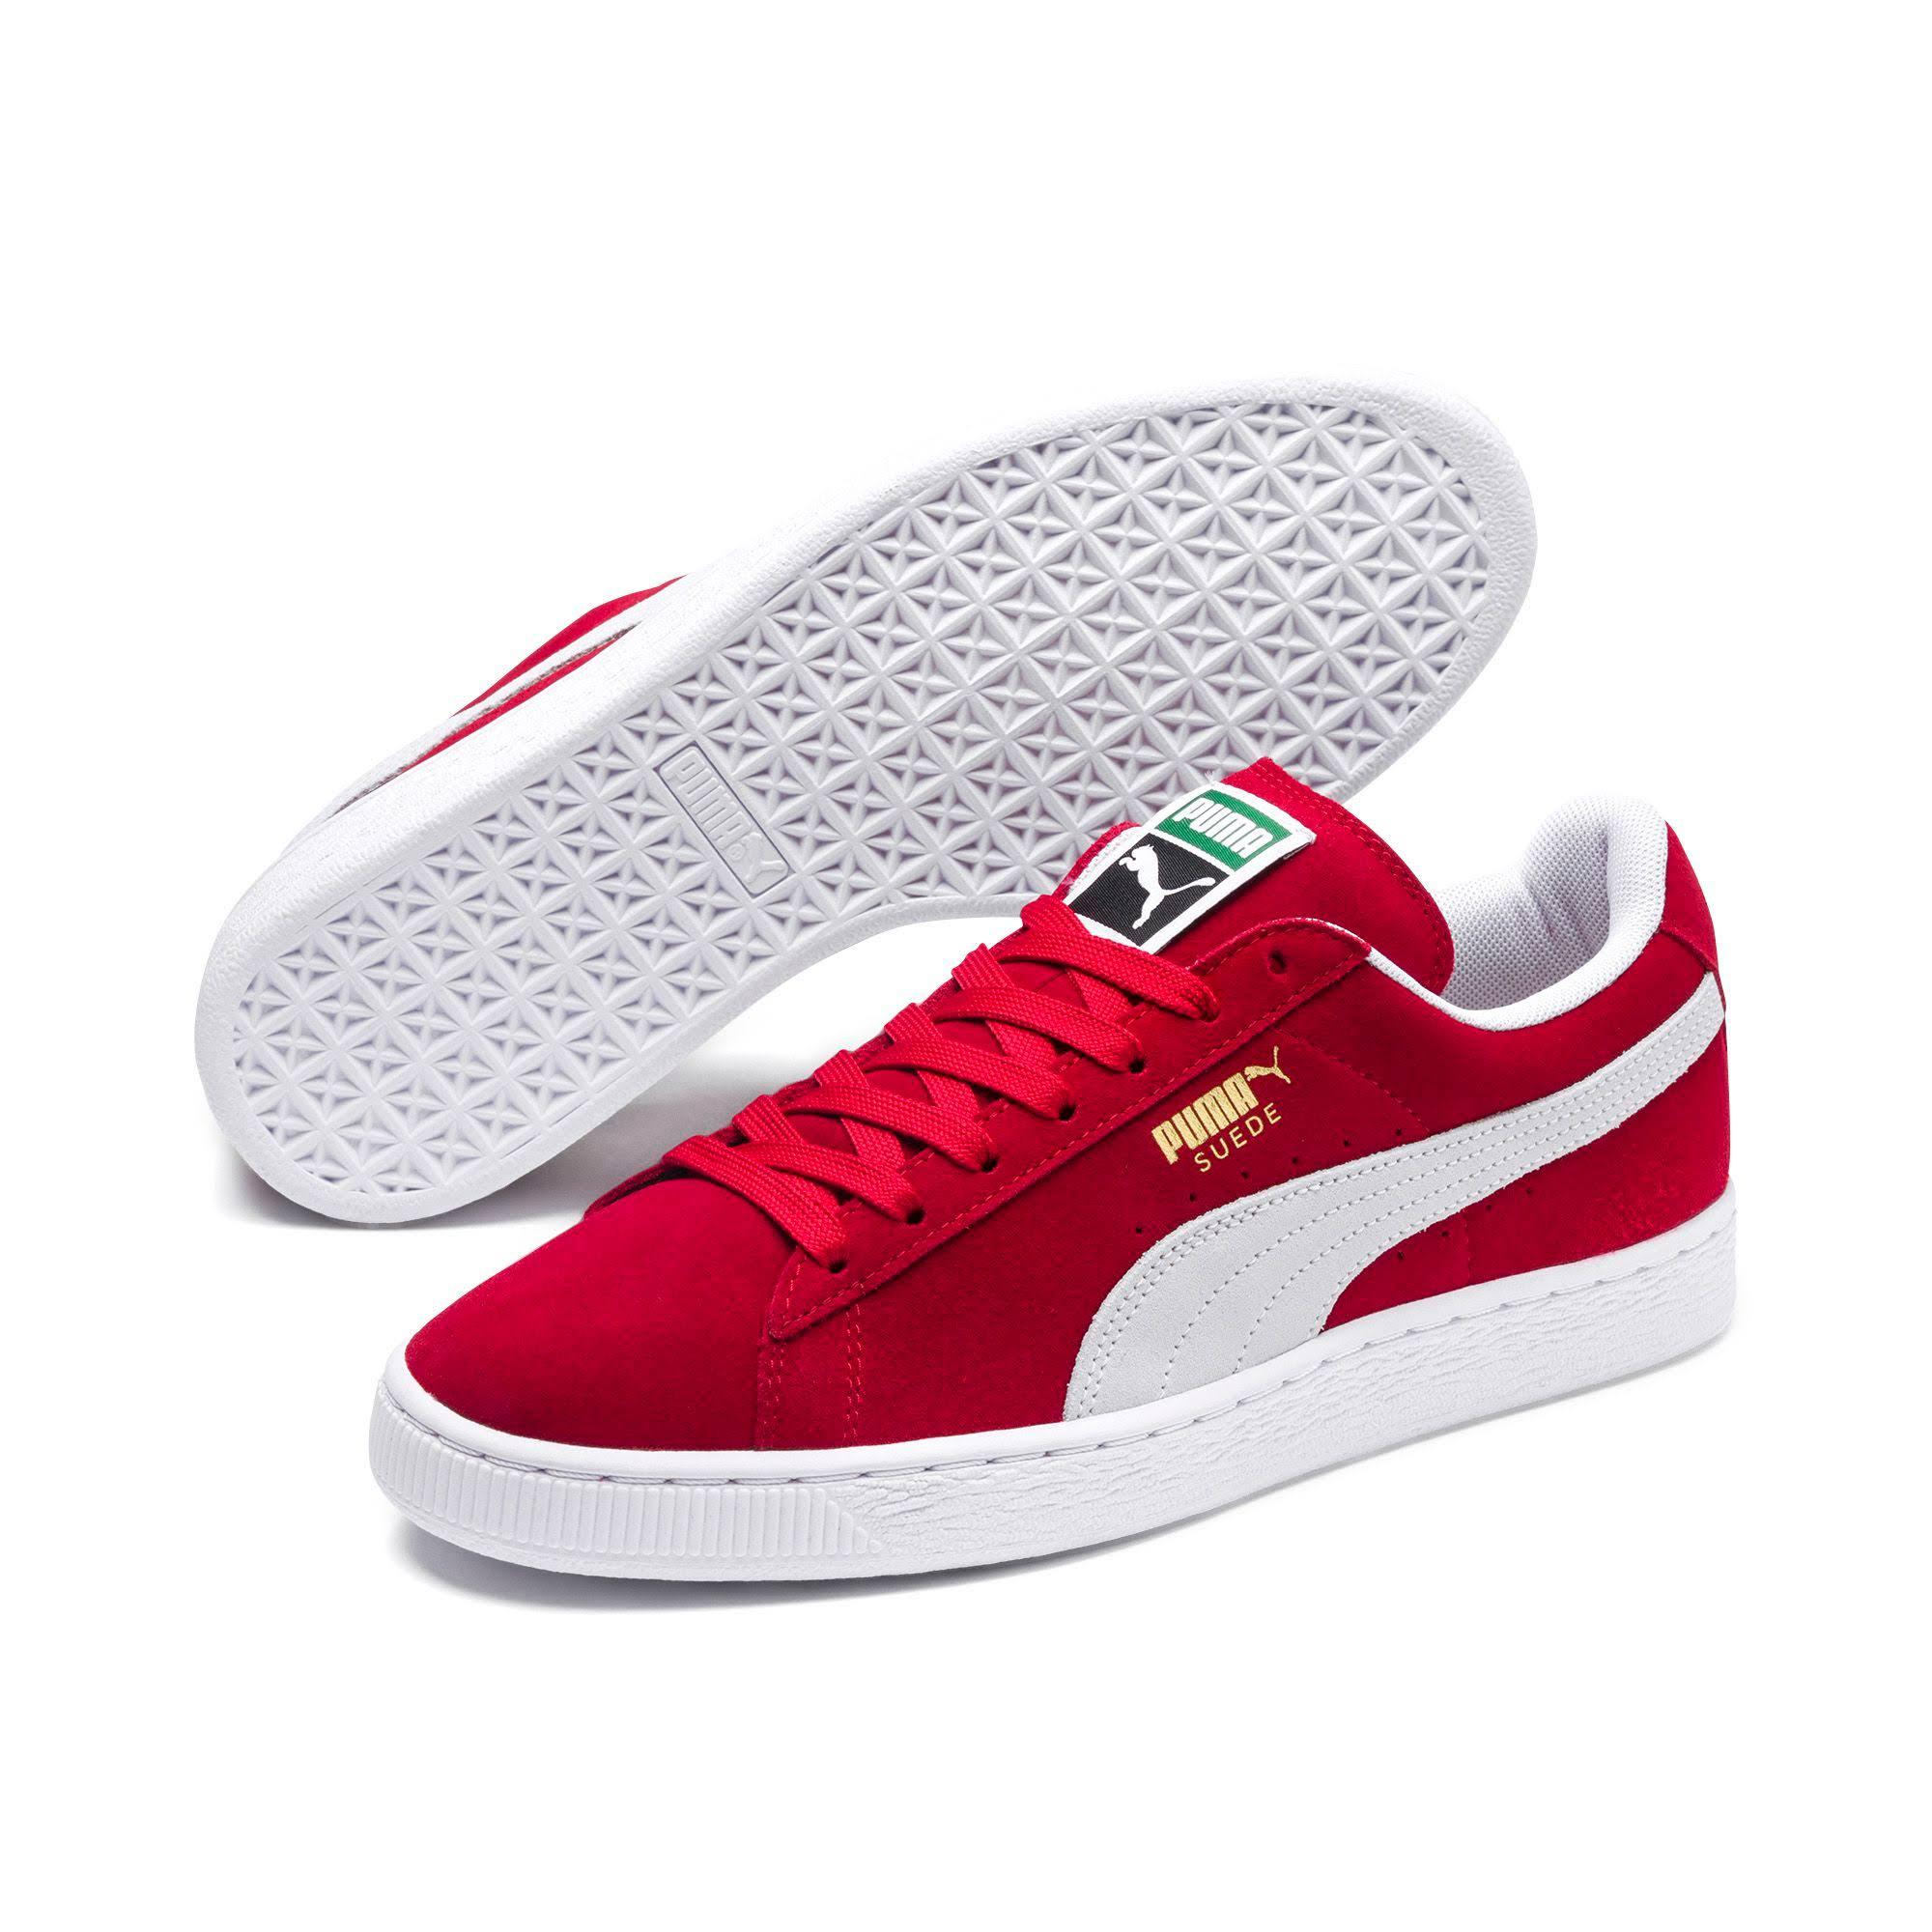 Lace Up Hombre Suede Zapatillas Rojo Classic Puma wZfHxq